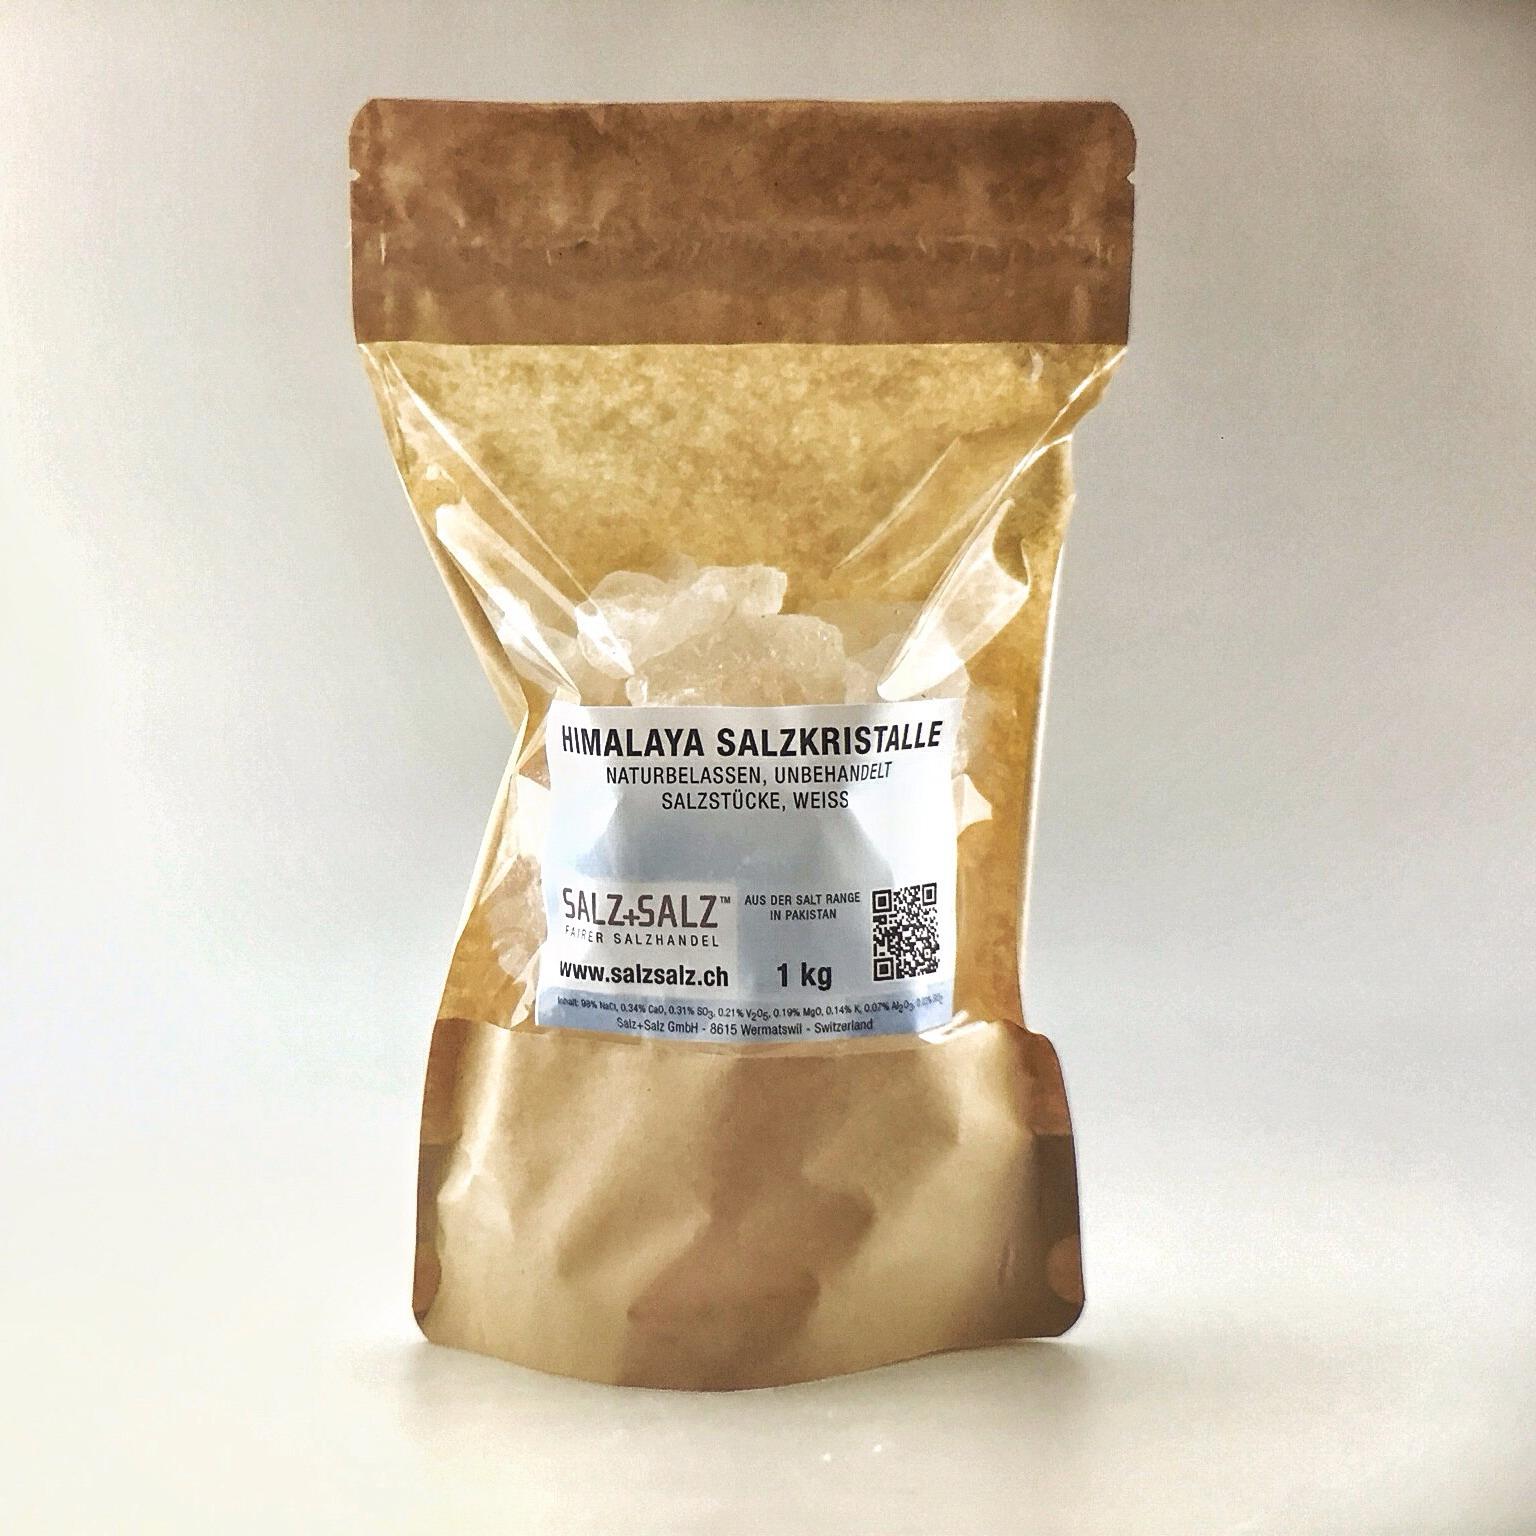 Himalaya Salzkristalle weiss im Papierbeutel 1kg